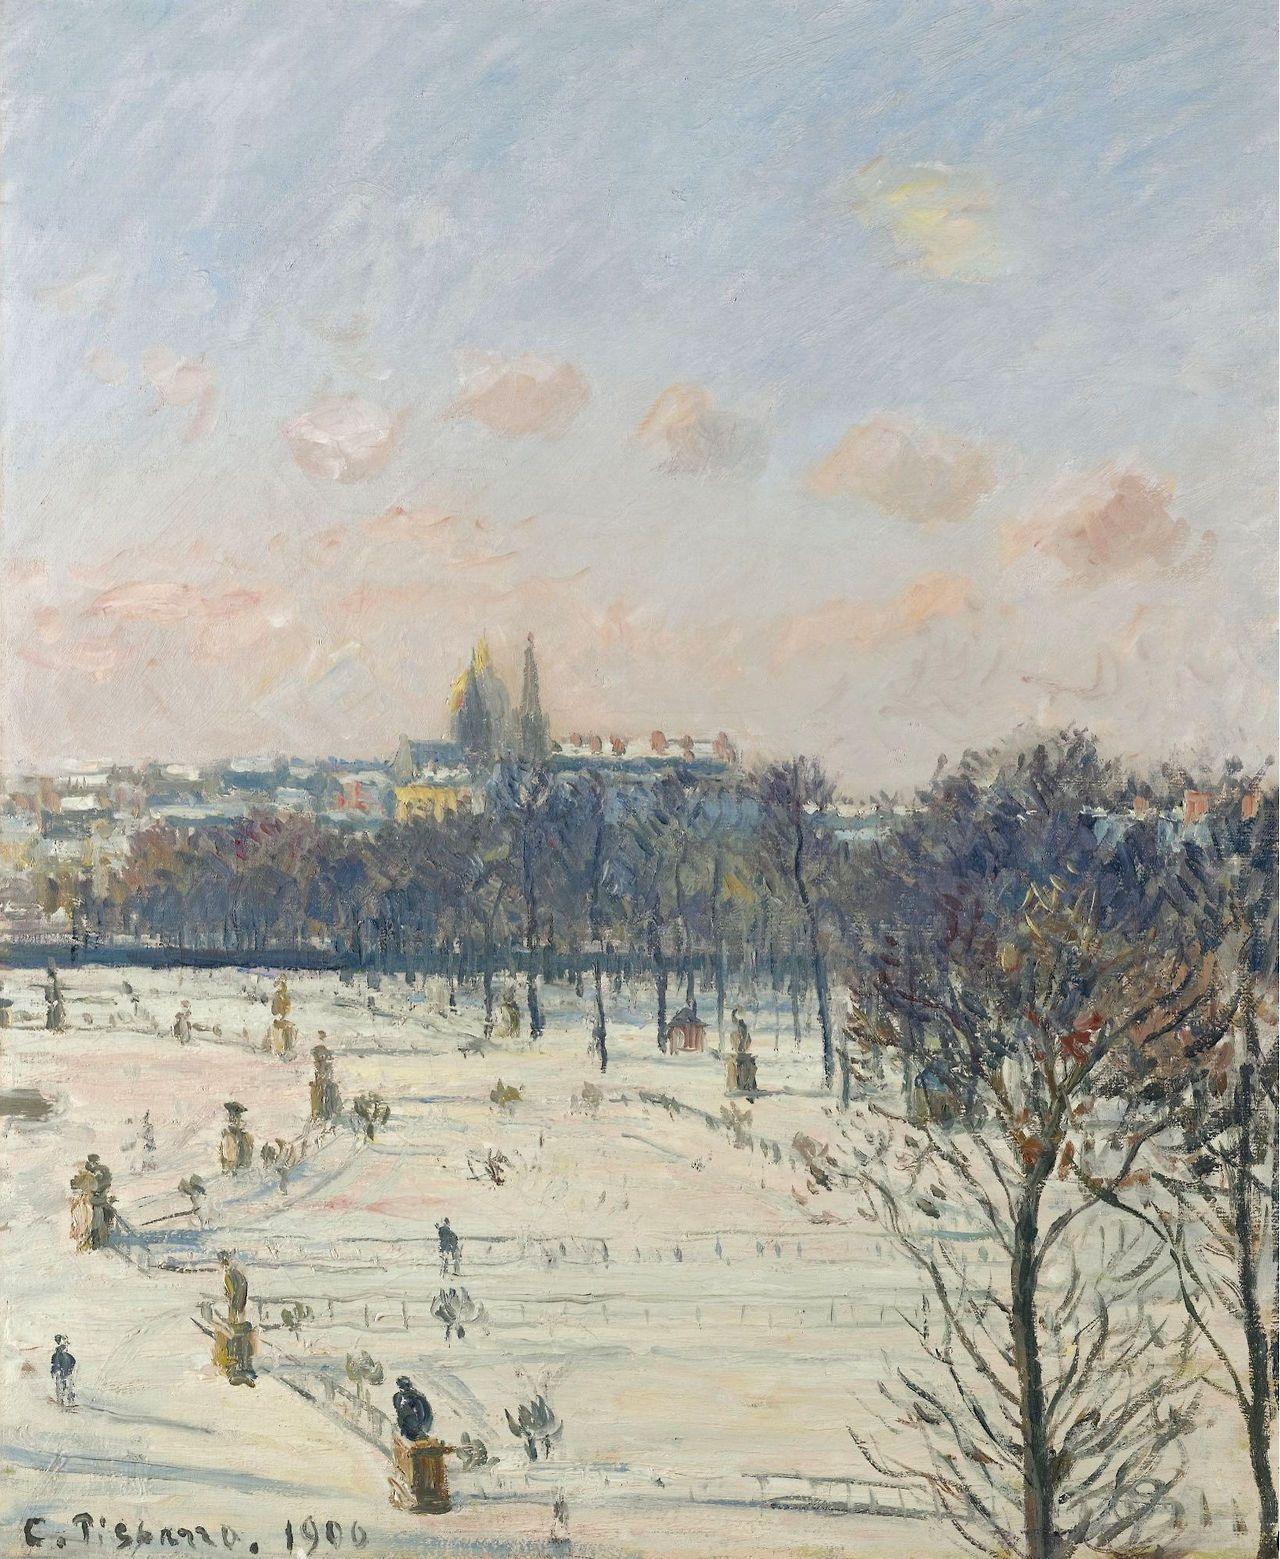 Le jardin des Tuileries,effet de neige - Camille Pissarro 1900.